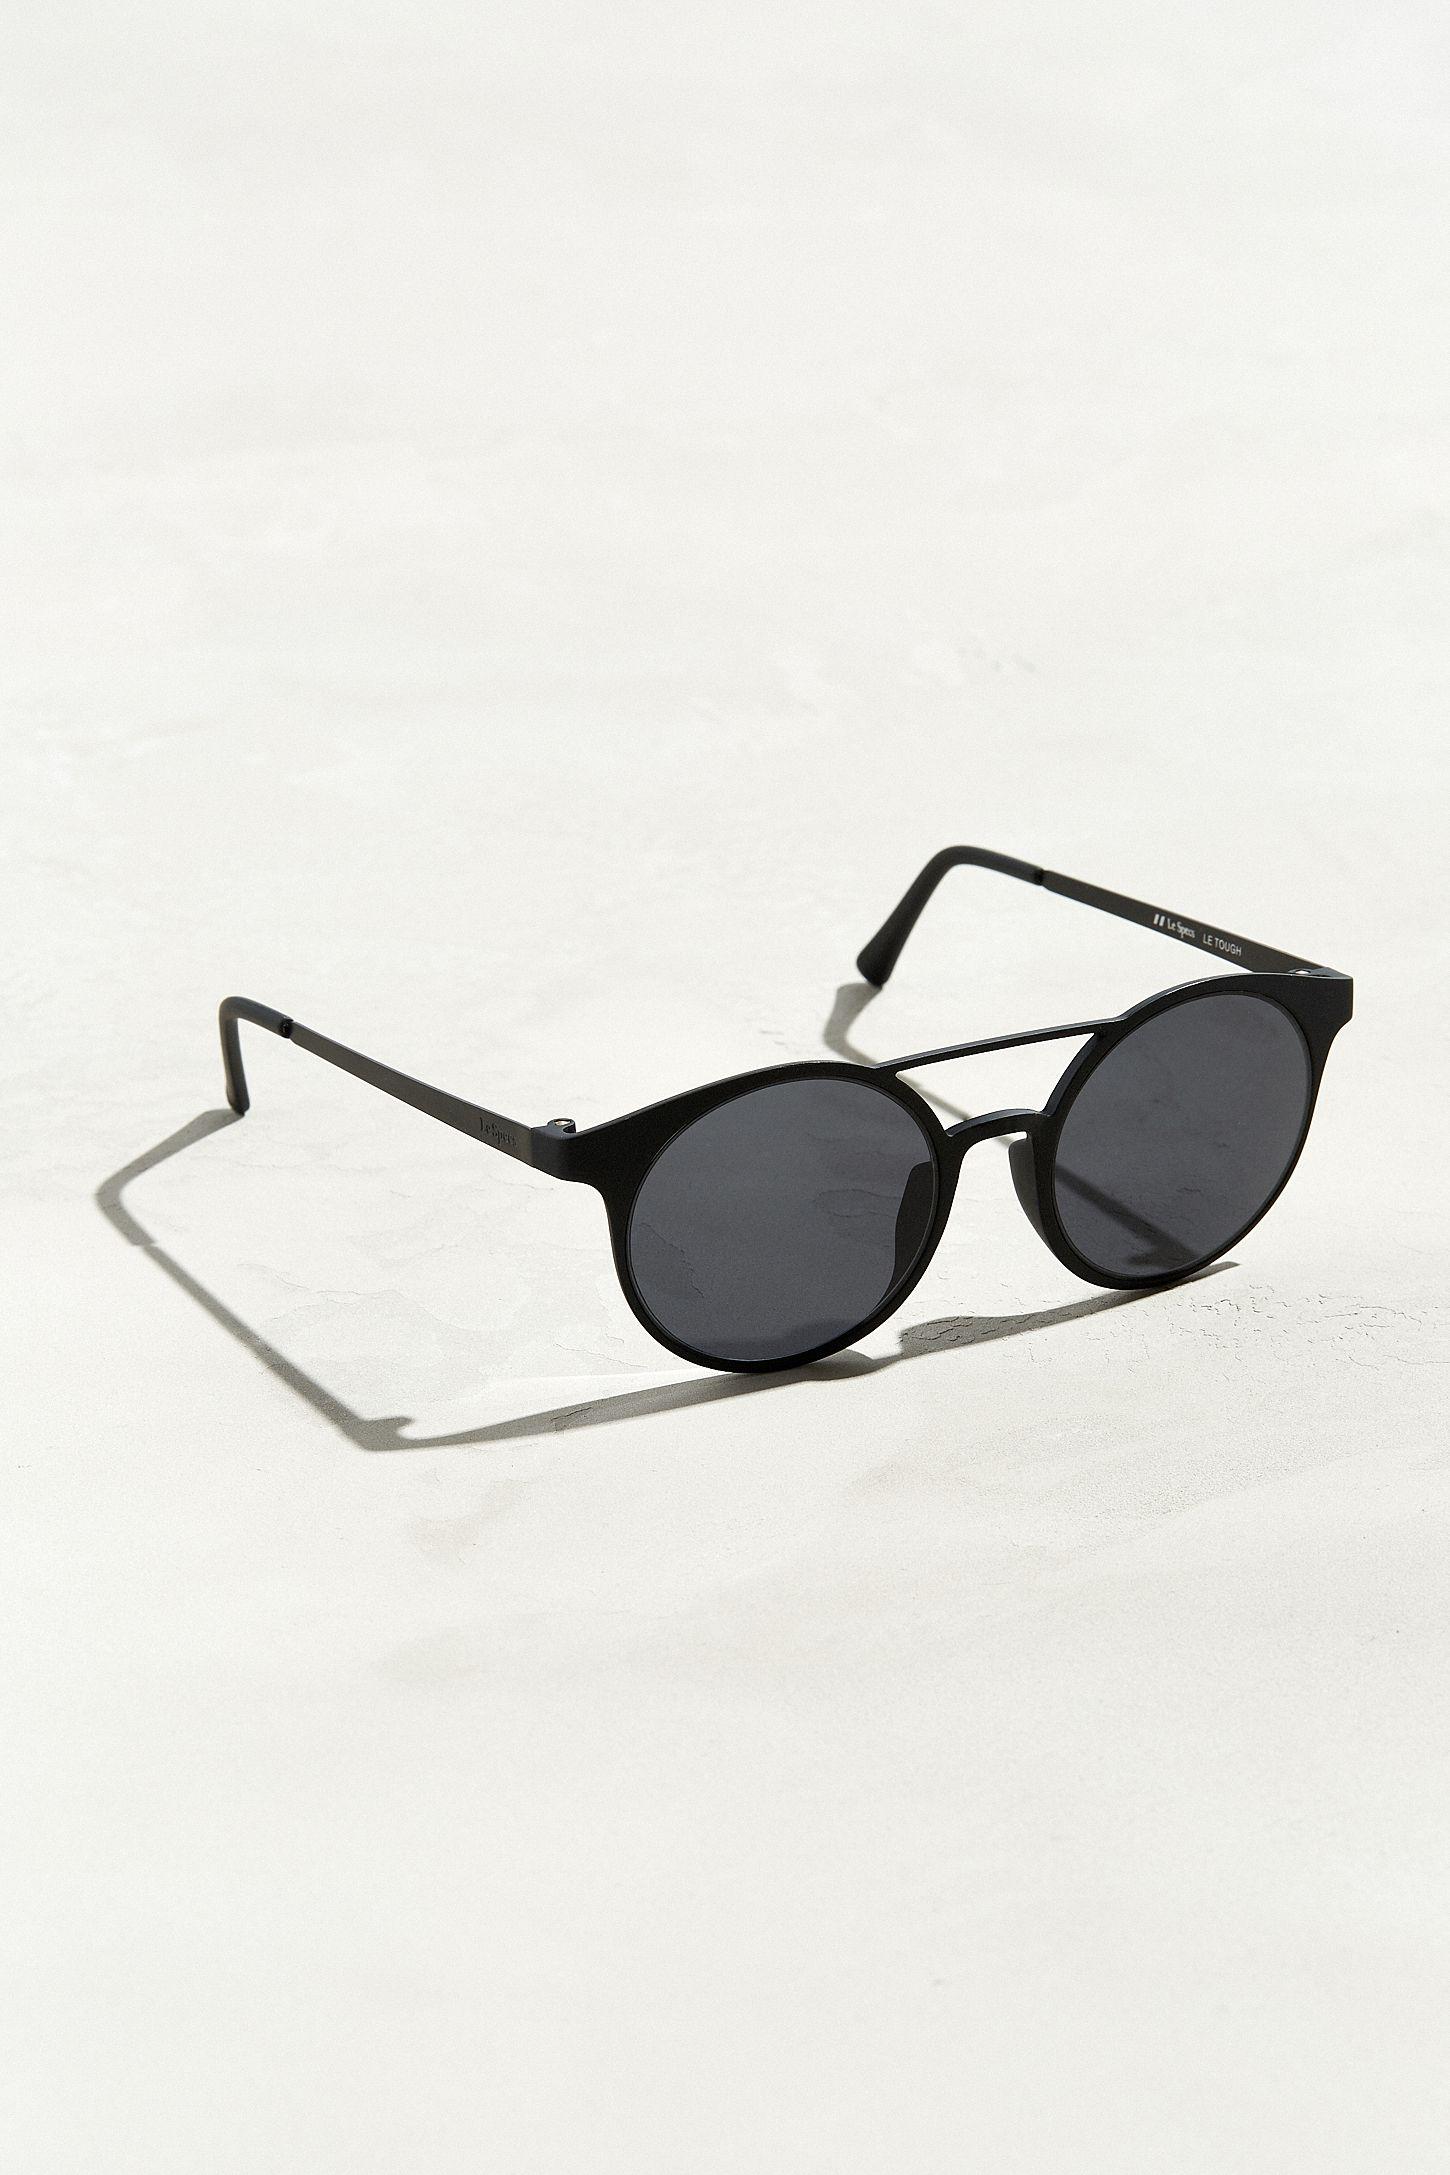 c714aa3c8330f1 Lunettes de soleil Demo Mode Le Specs   Urban Outfitters Canada